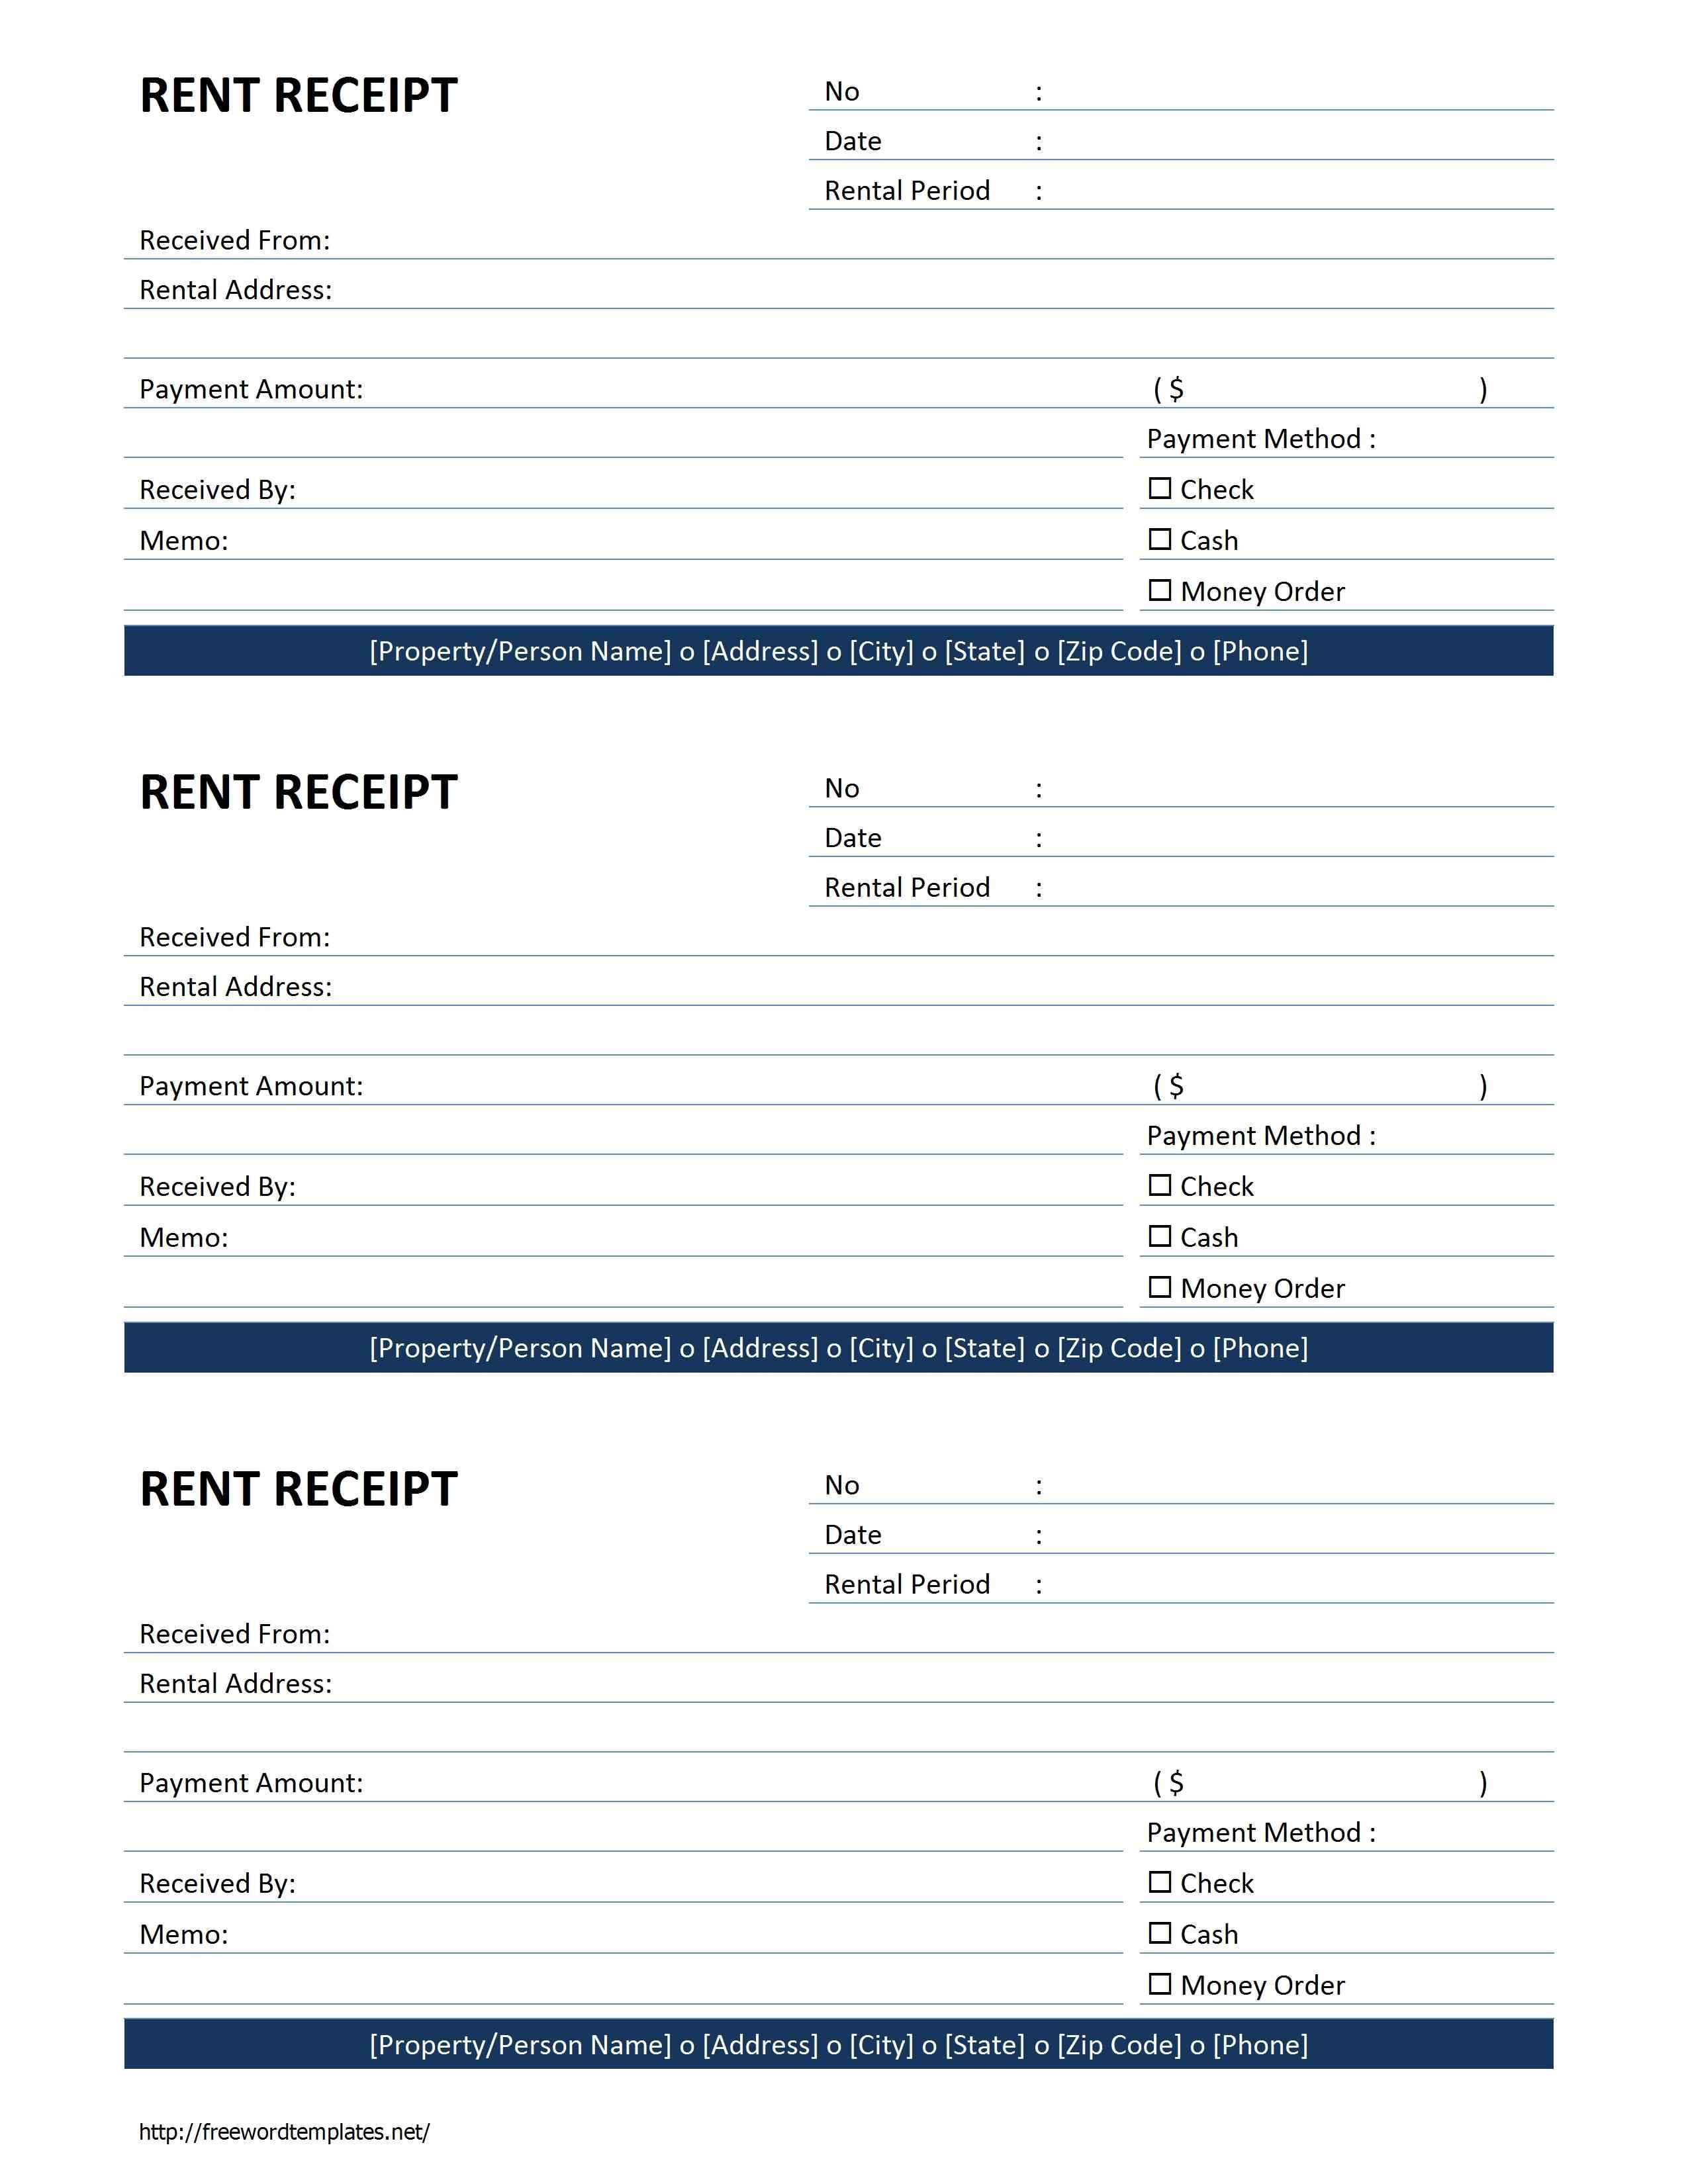 Rent Receipt Template | Free Microsoft Word Templates - Free Rent - Free Printable Rent Receipt